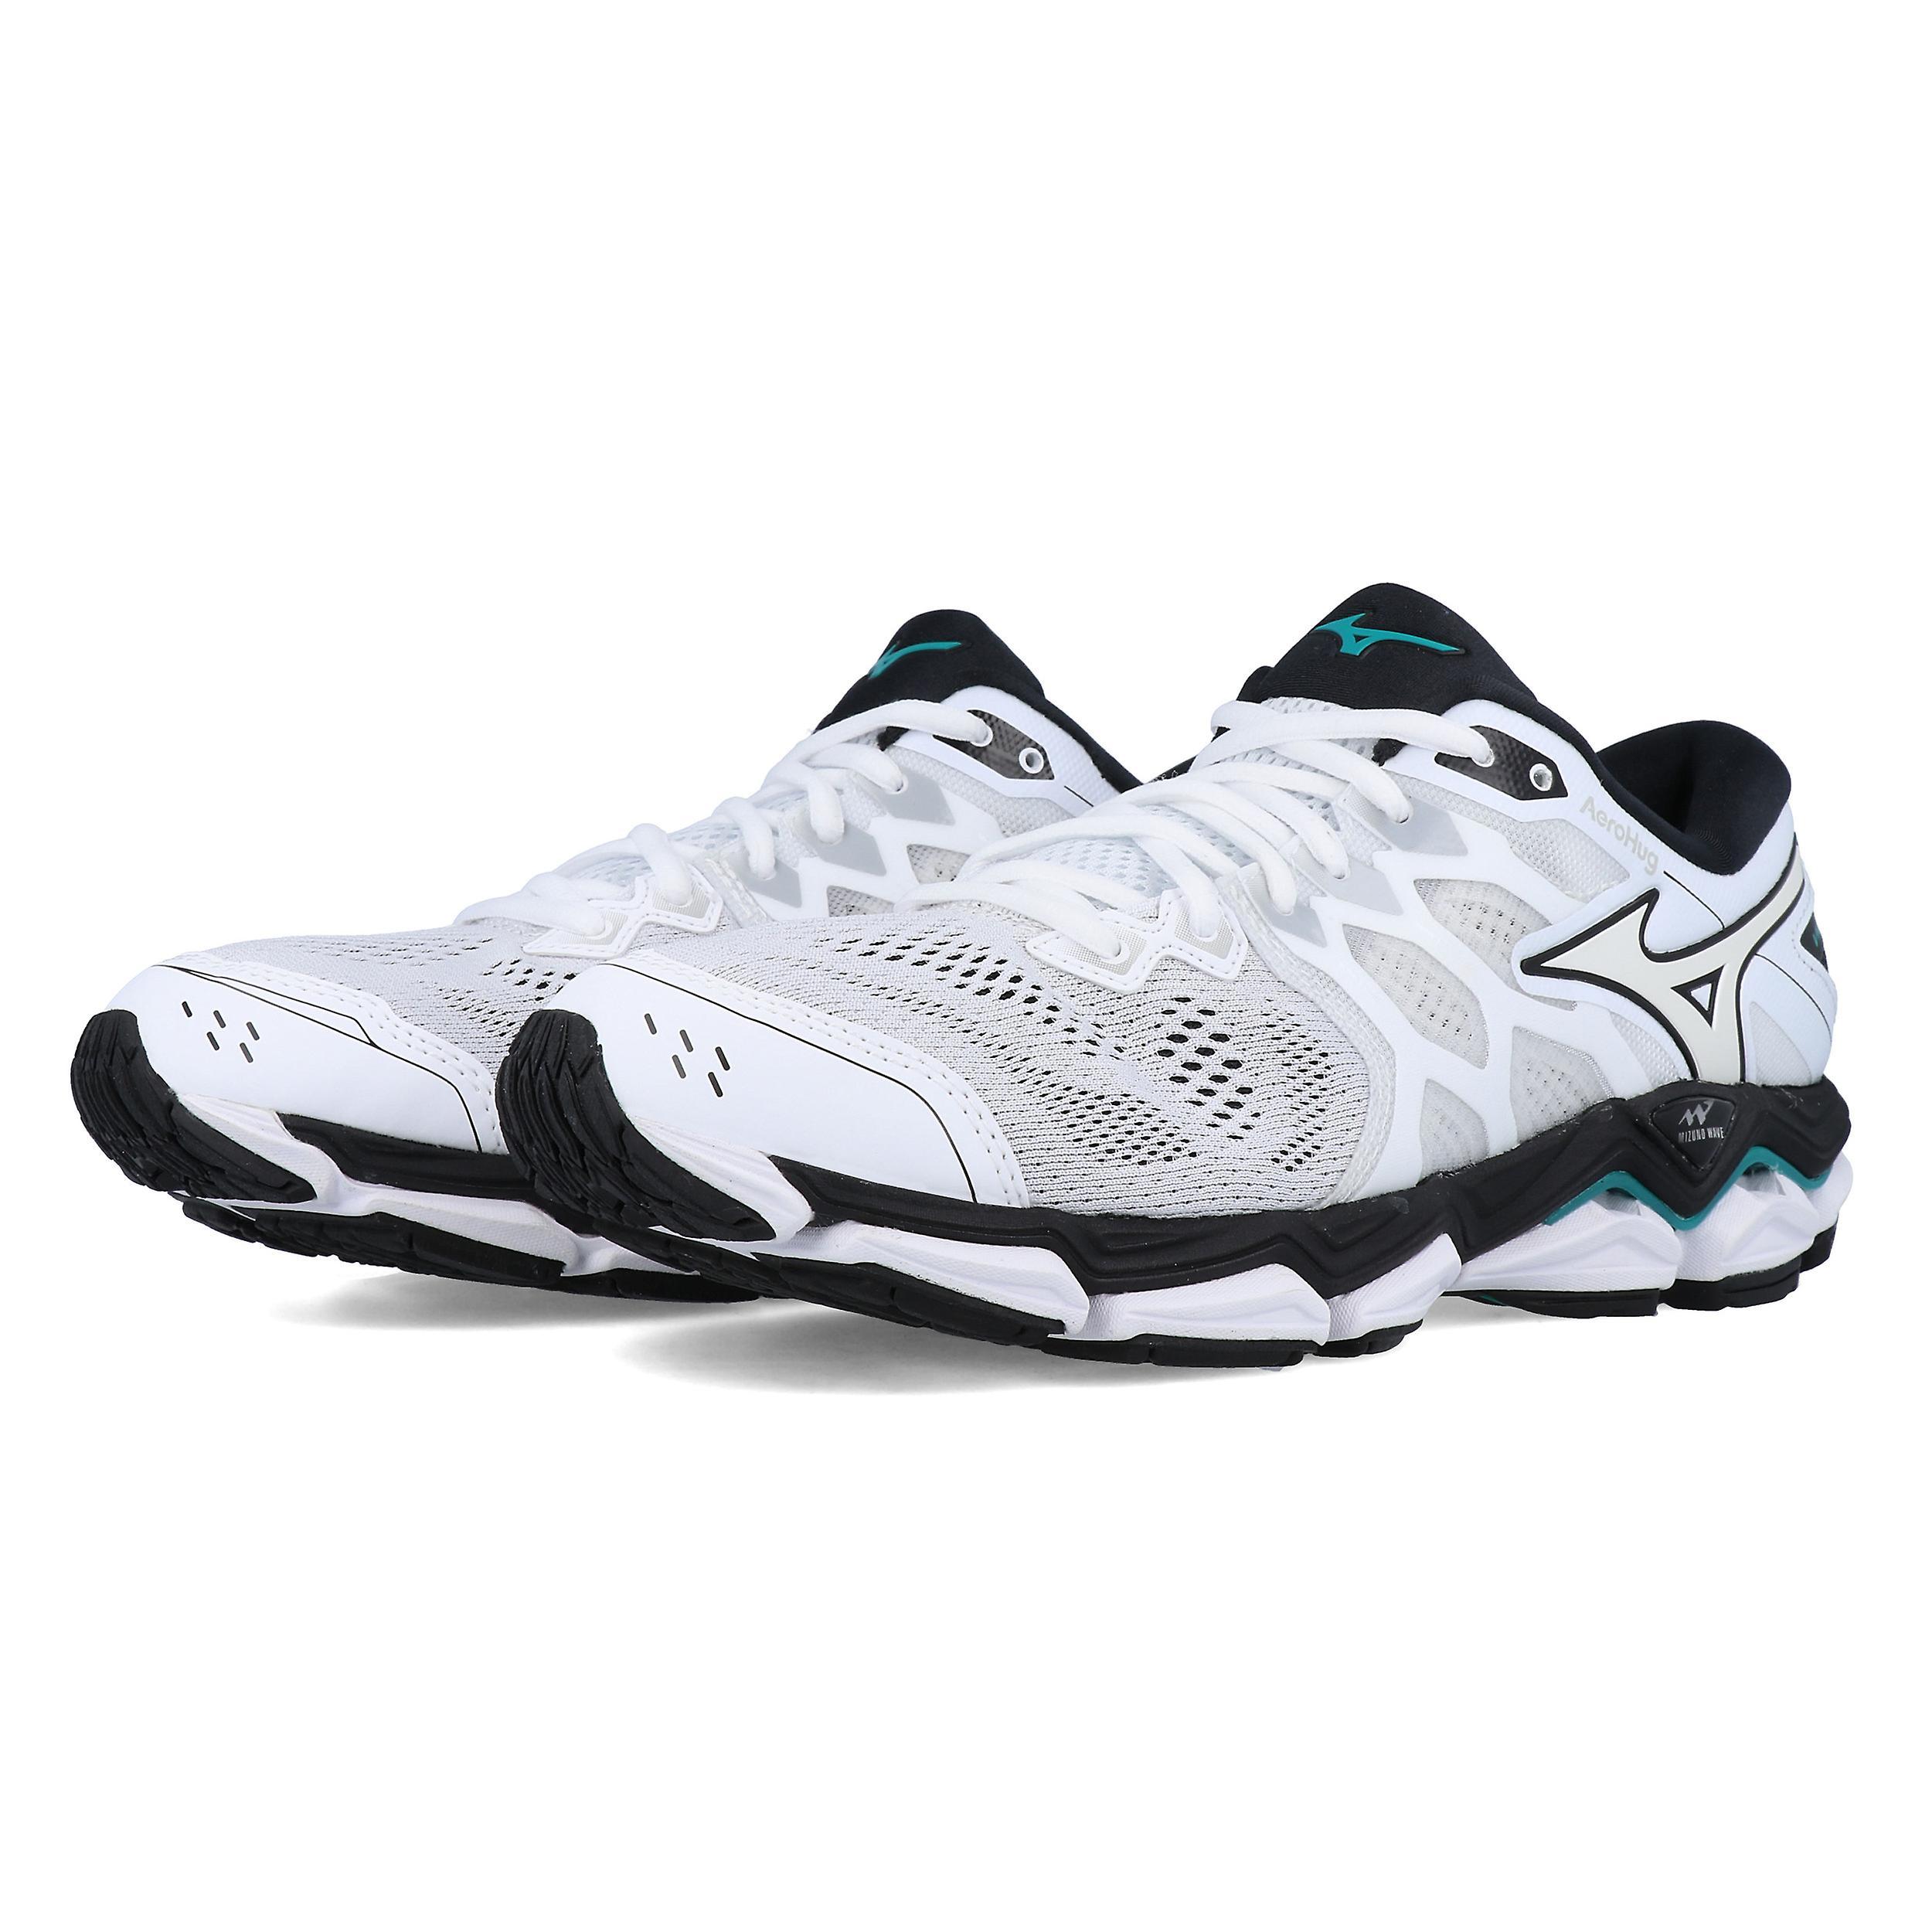 Mizuno Wave Horizon 3 Running Shoes